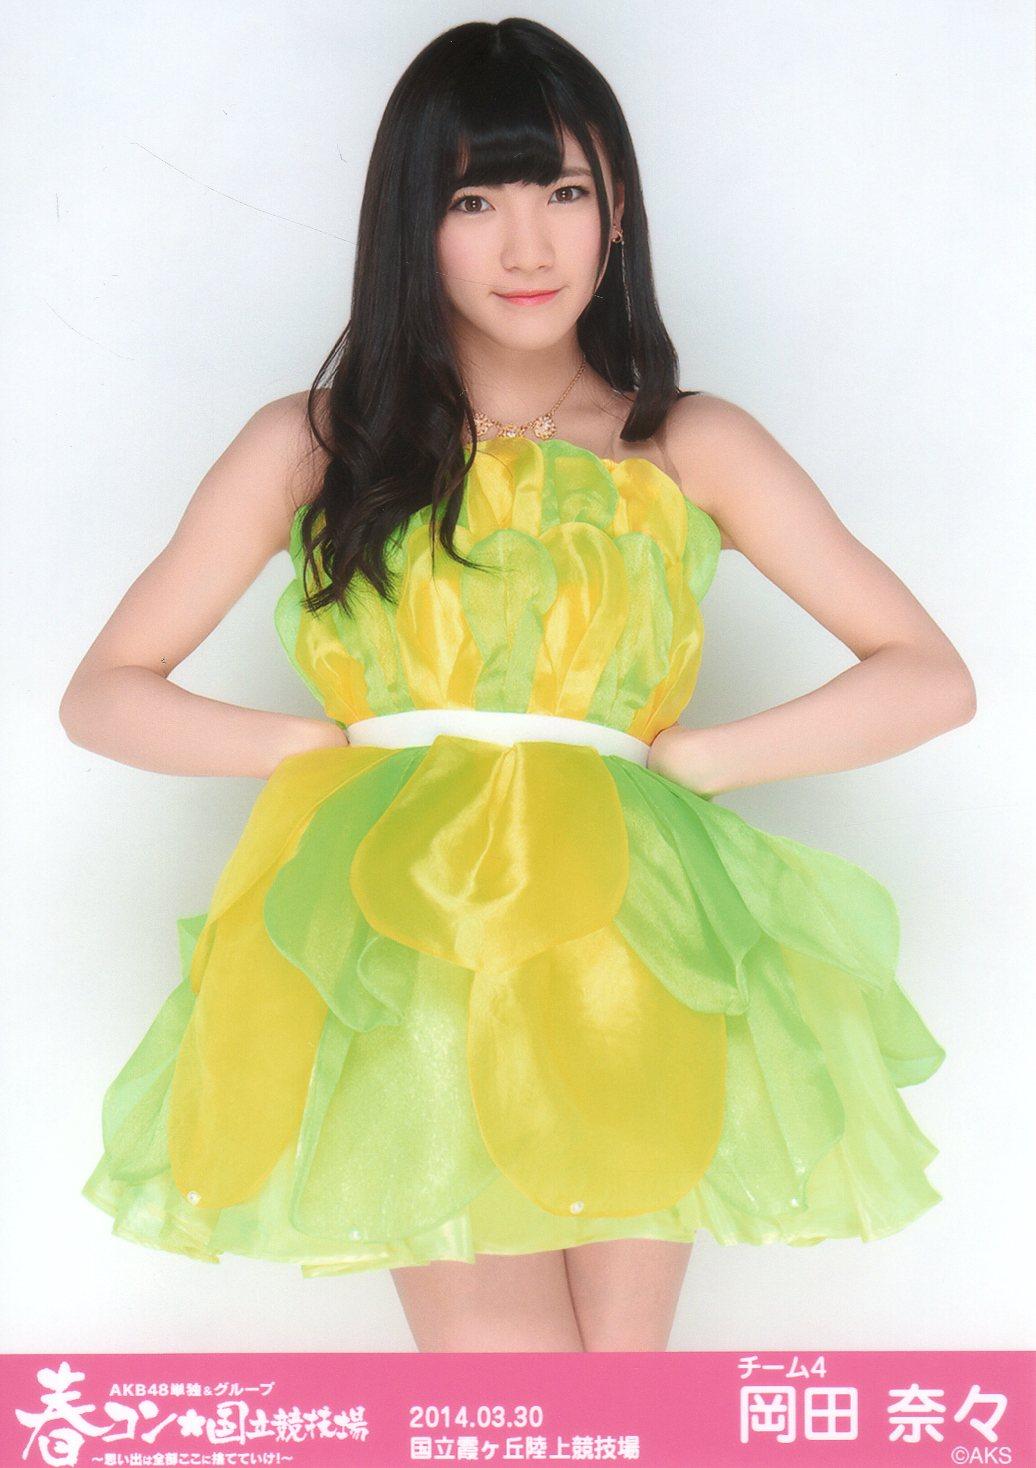 Okada Nana - AKB48 Photo (36965289) - Fanpop